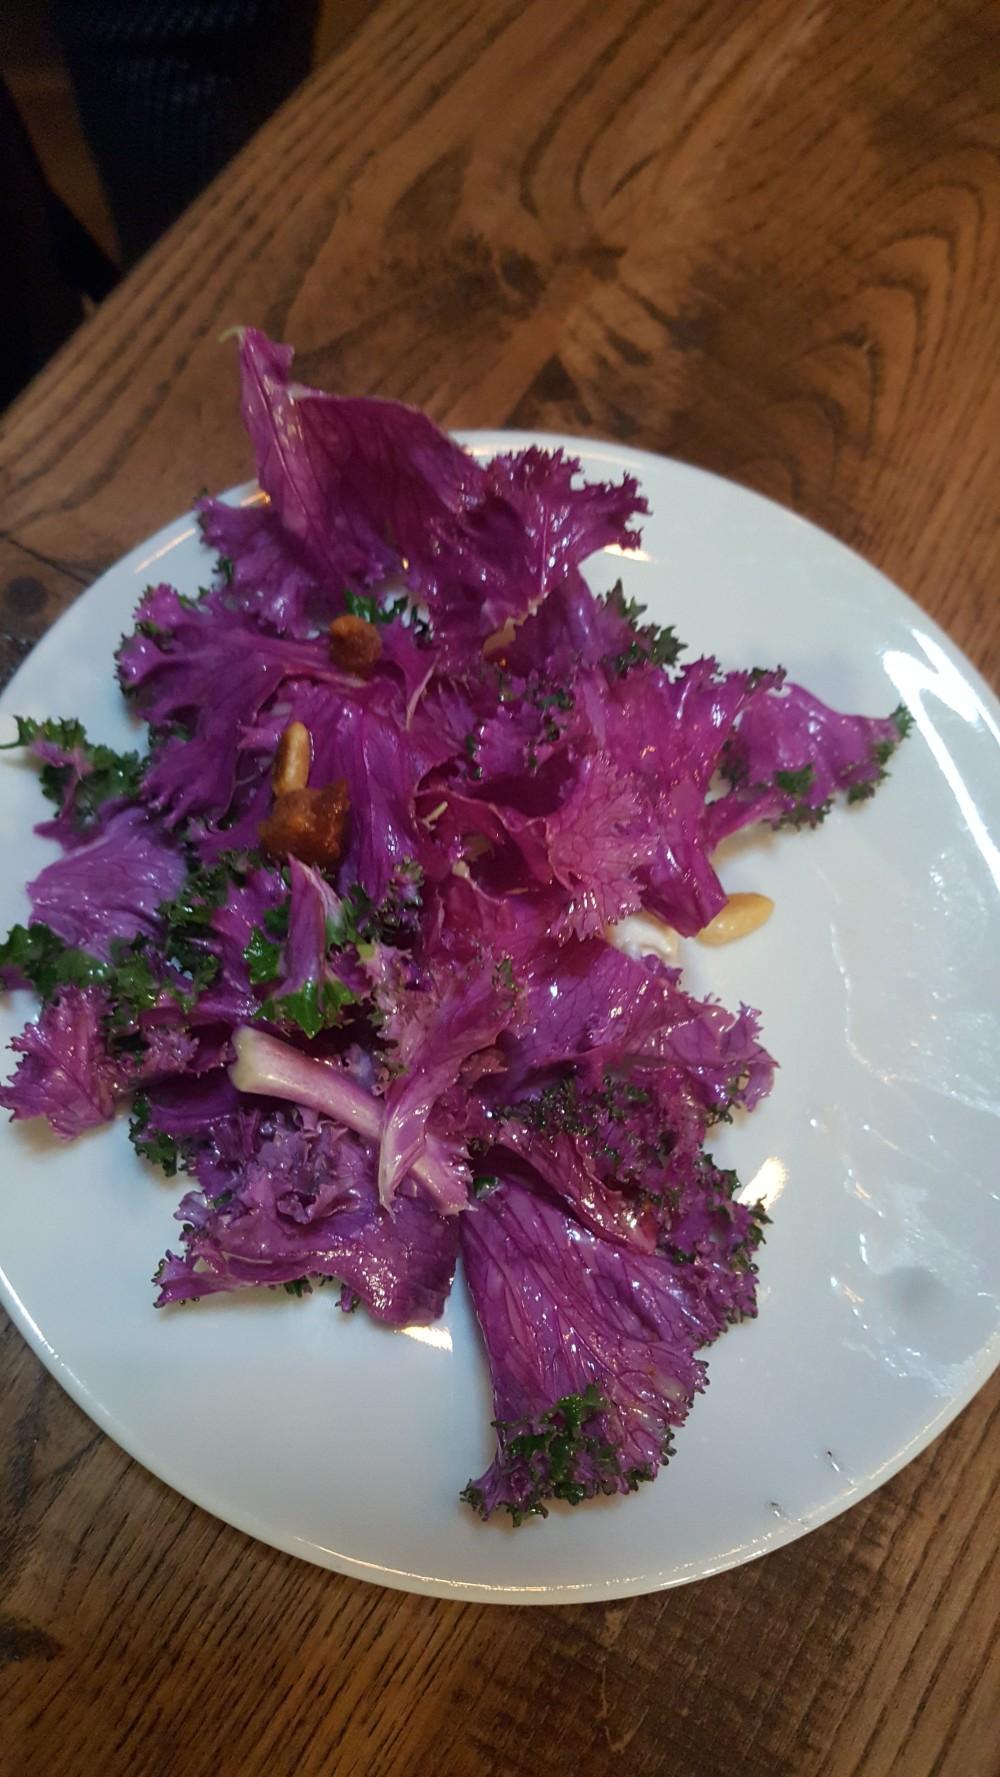 Purple kale, anyone?